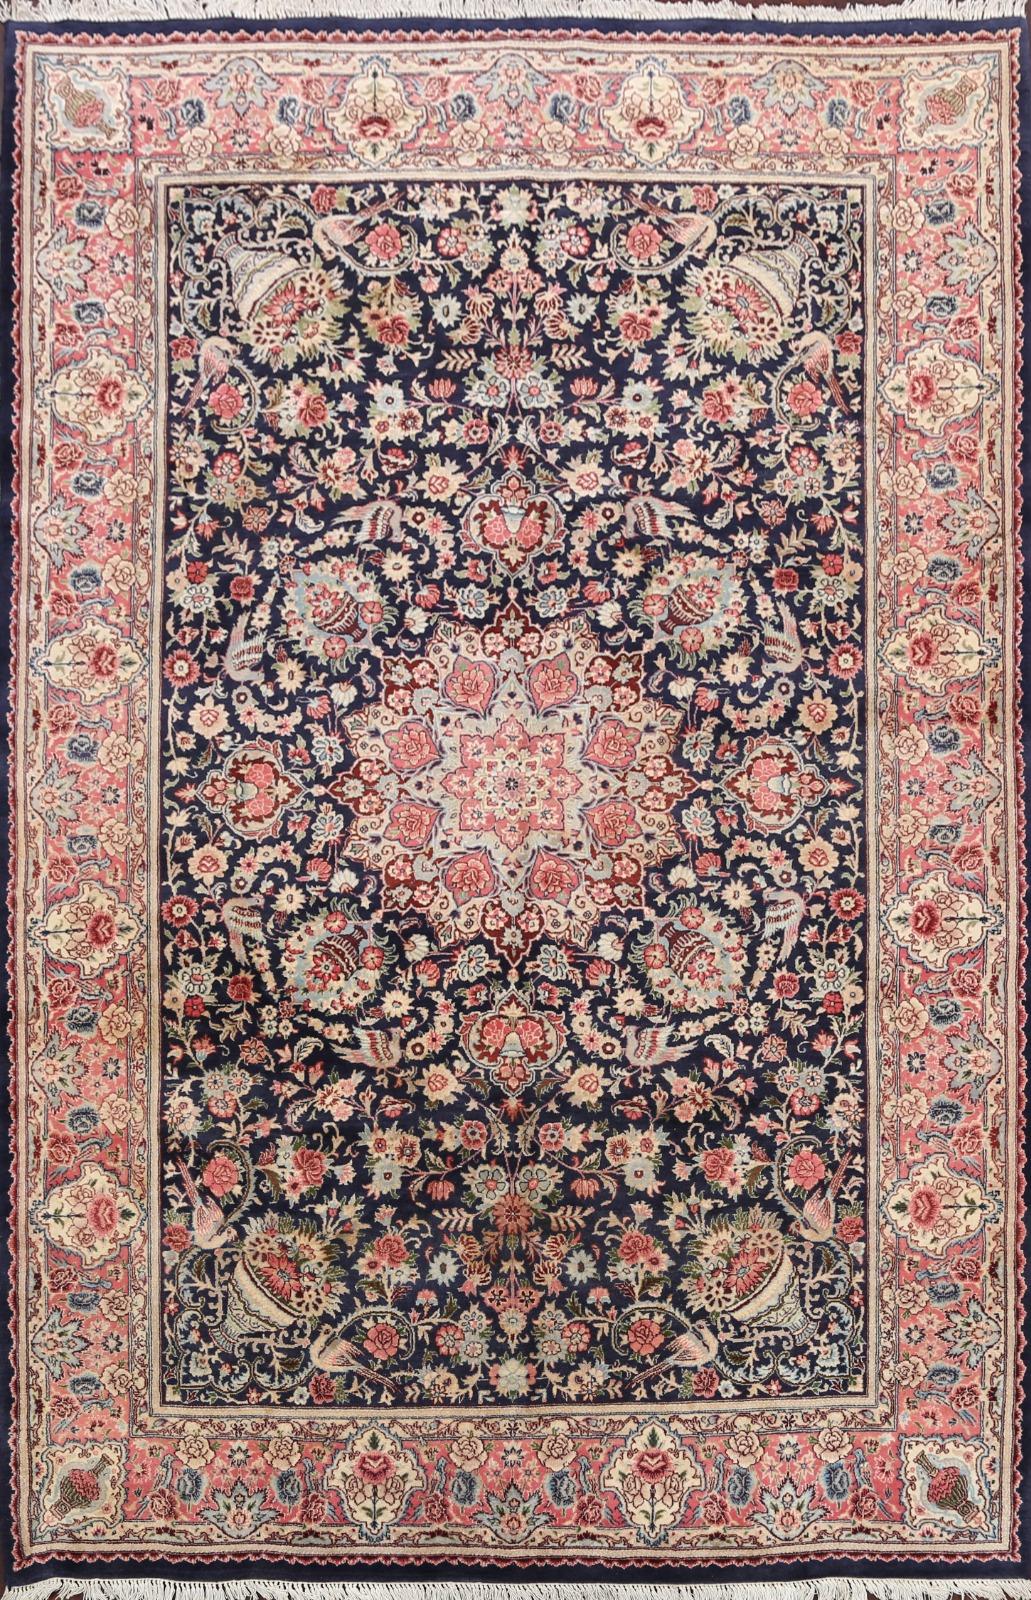 Picture of: Bird Design Floral Navy Blue Pink Hereke Turkish Oriental Area Rug Wool 6×9 Ft Ebay